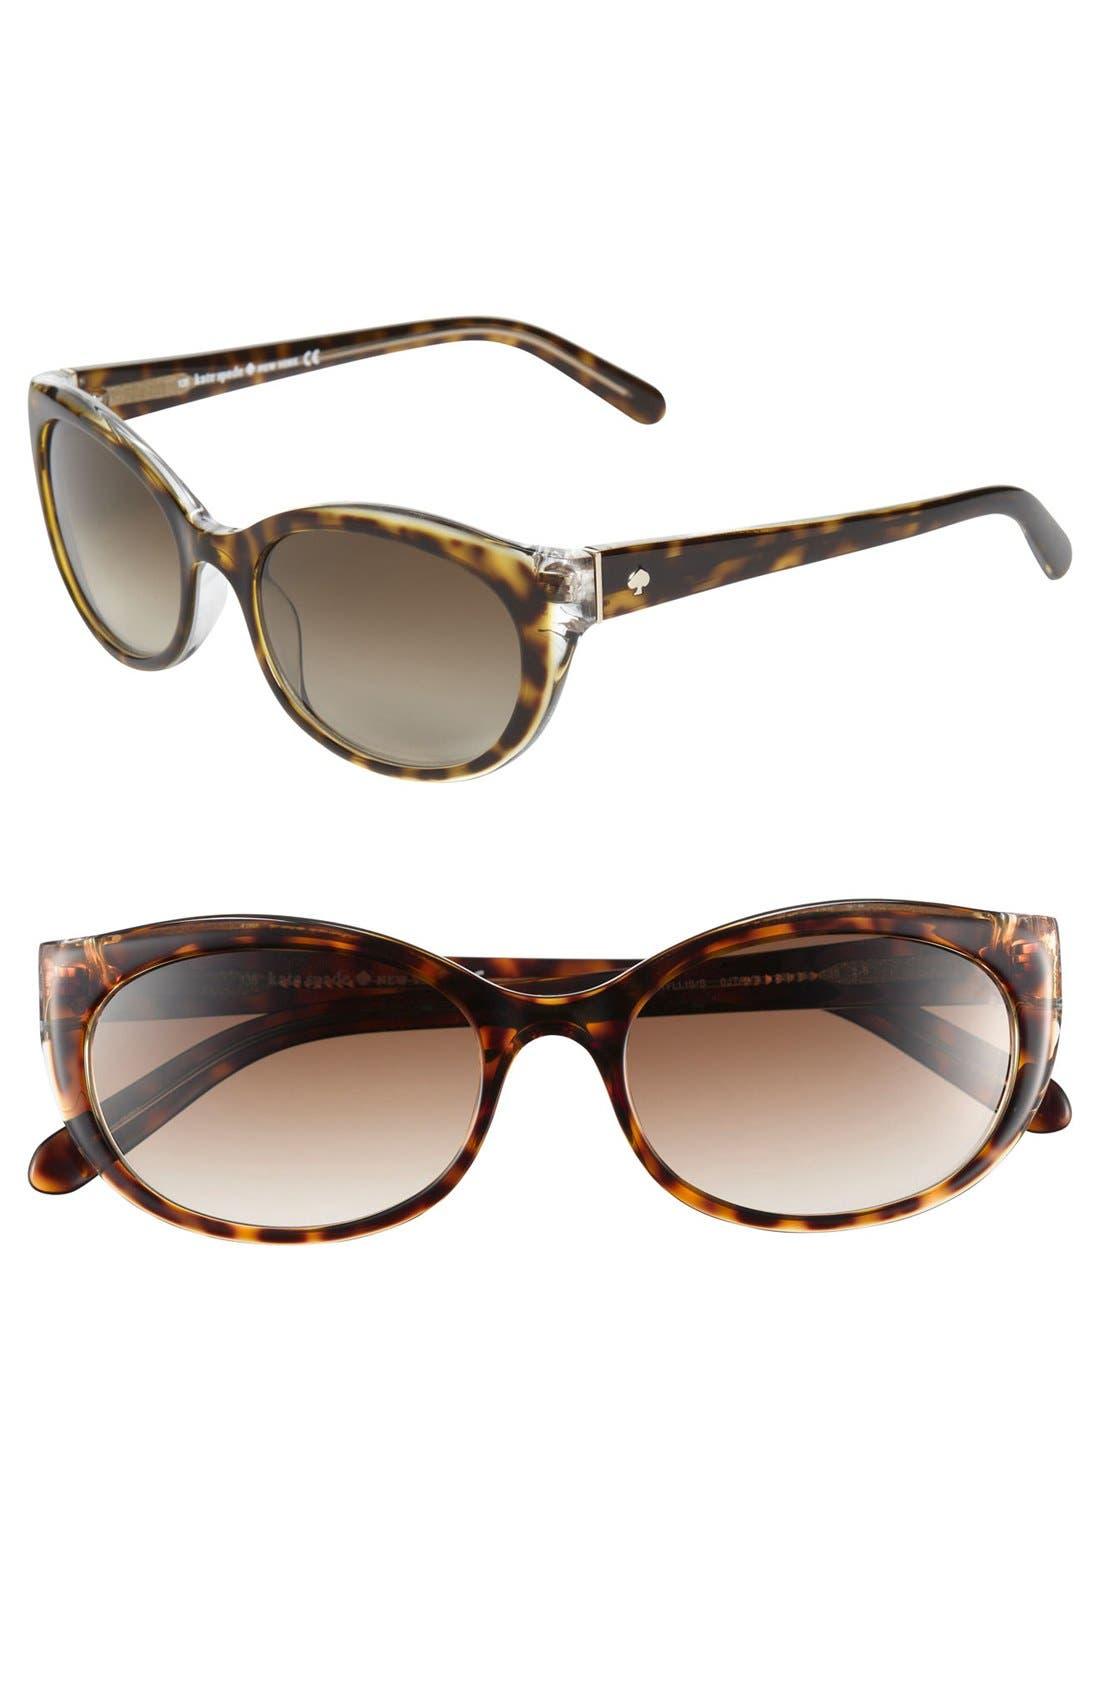 Main Image - kate spade new york 'phyllis' 52mm sunglasses